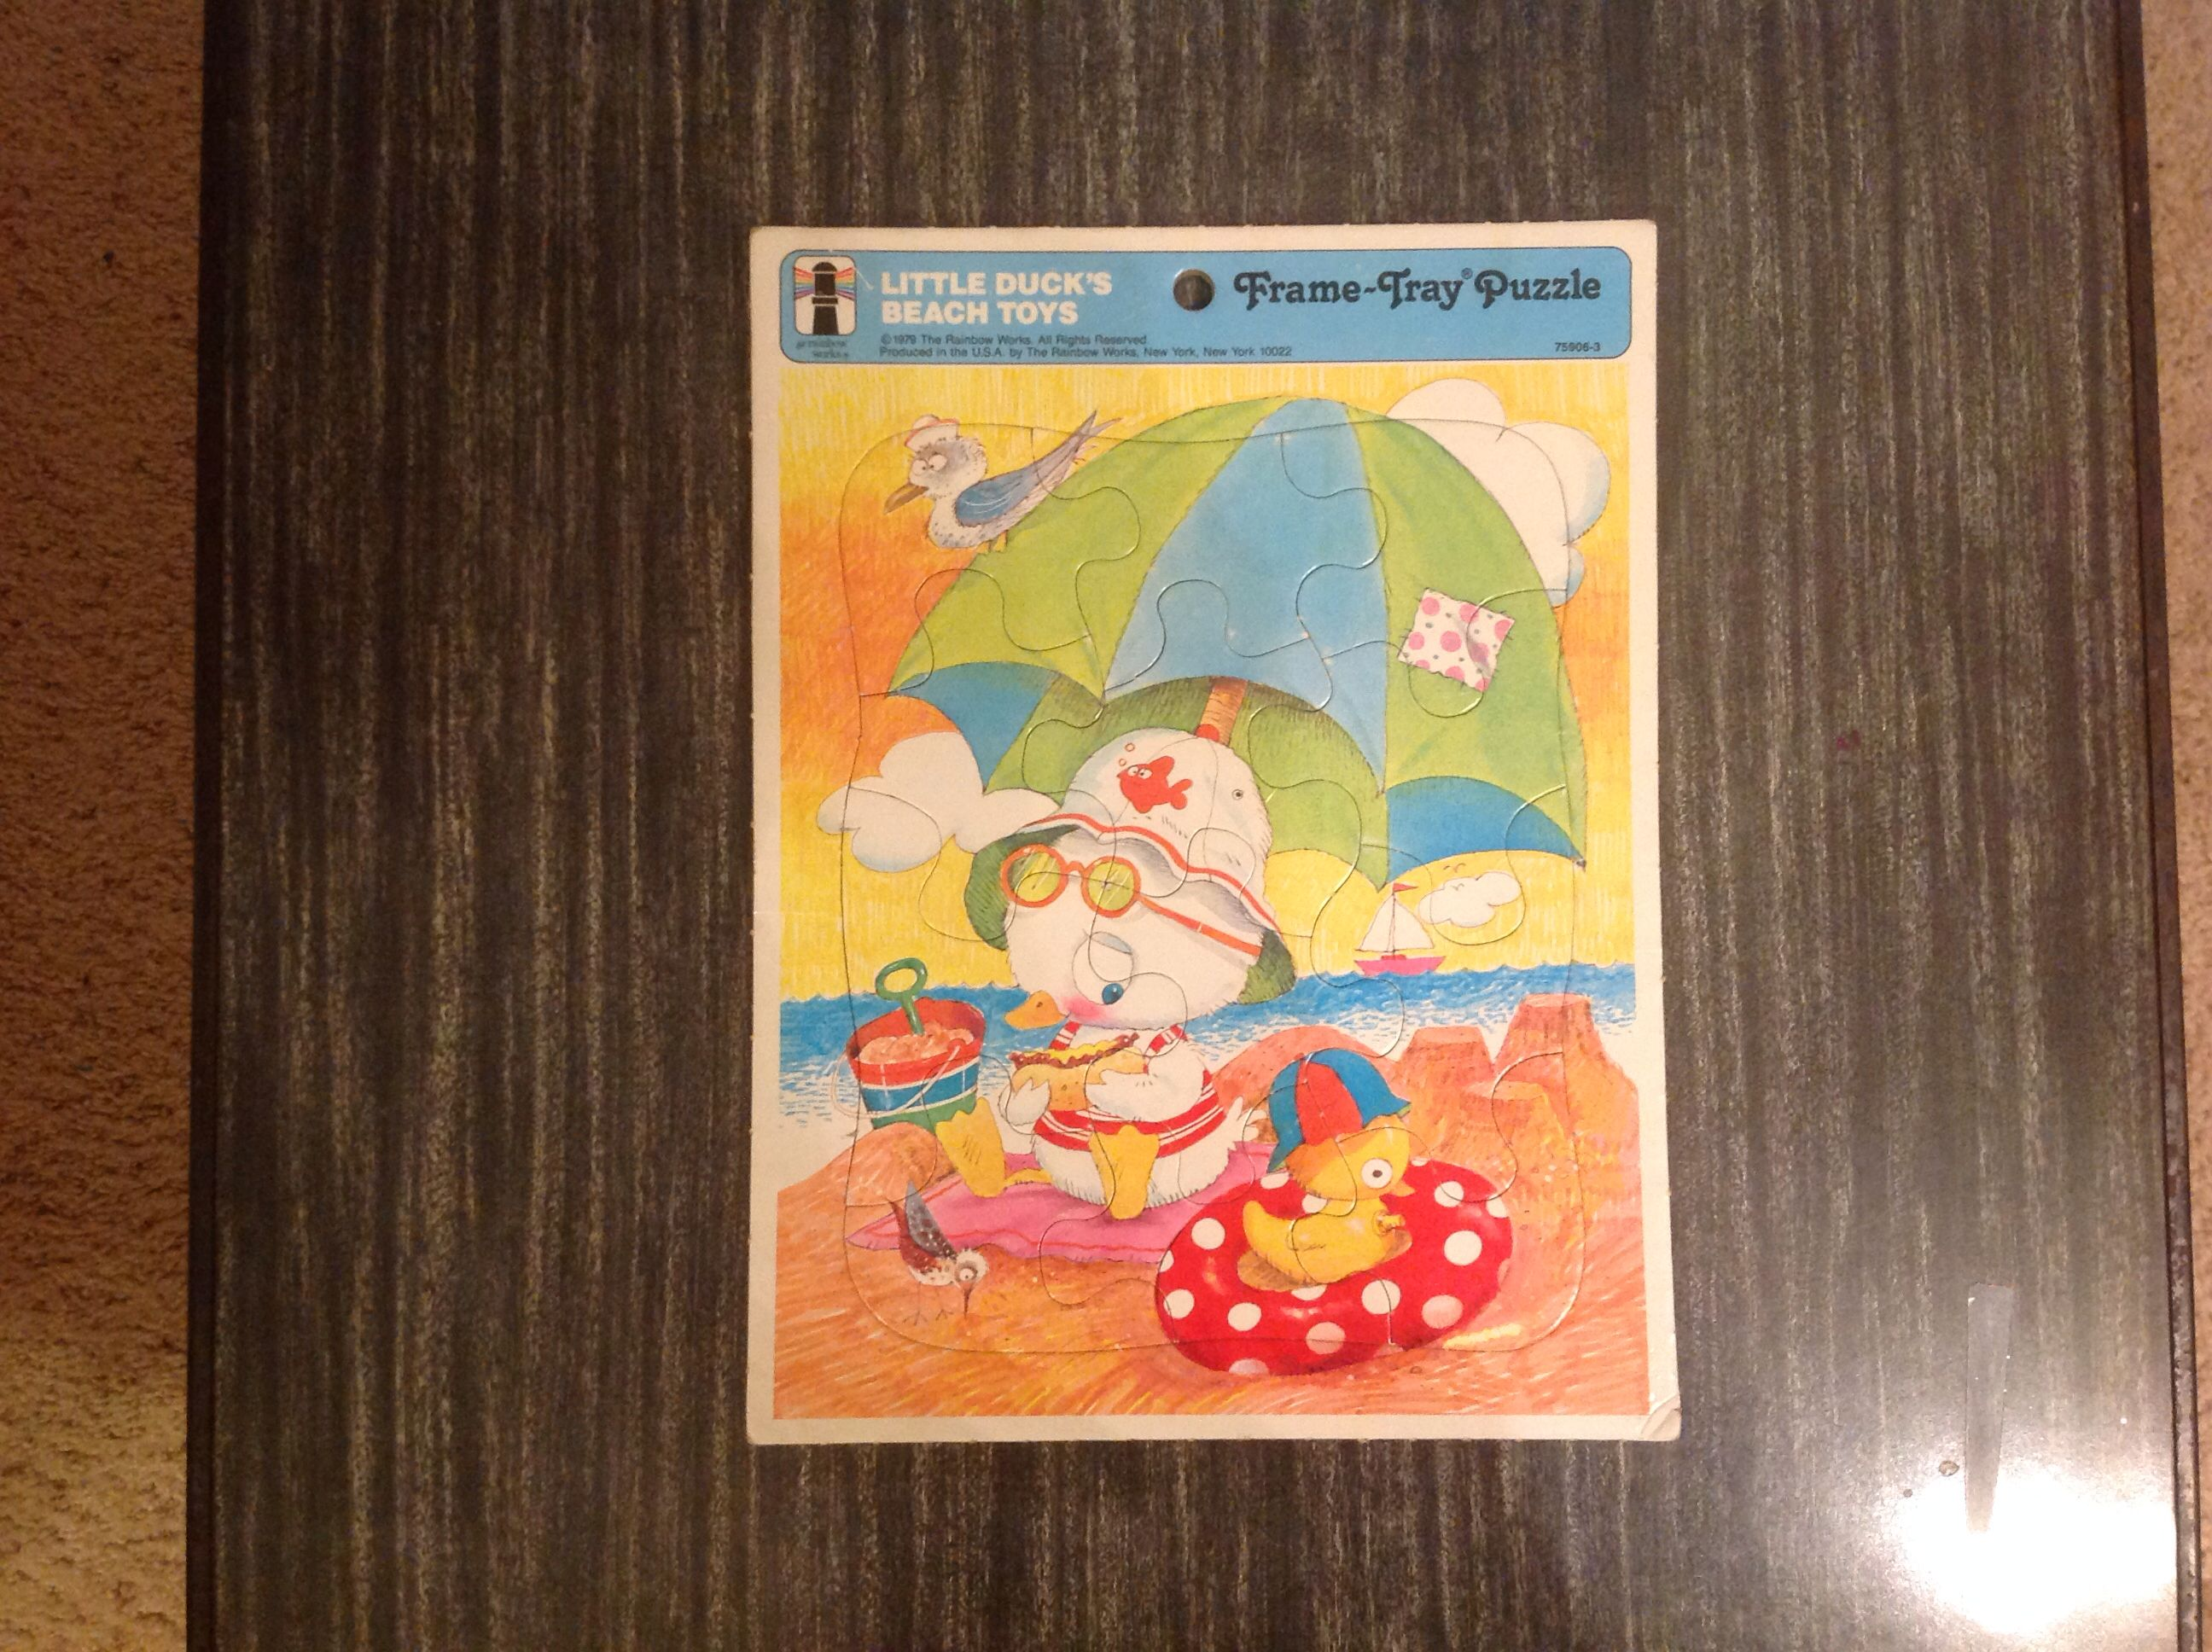 Vintage Rainbow Works puzzle, circa 1979.